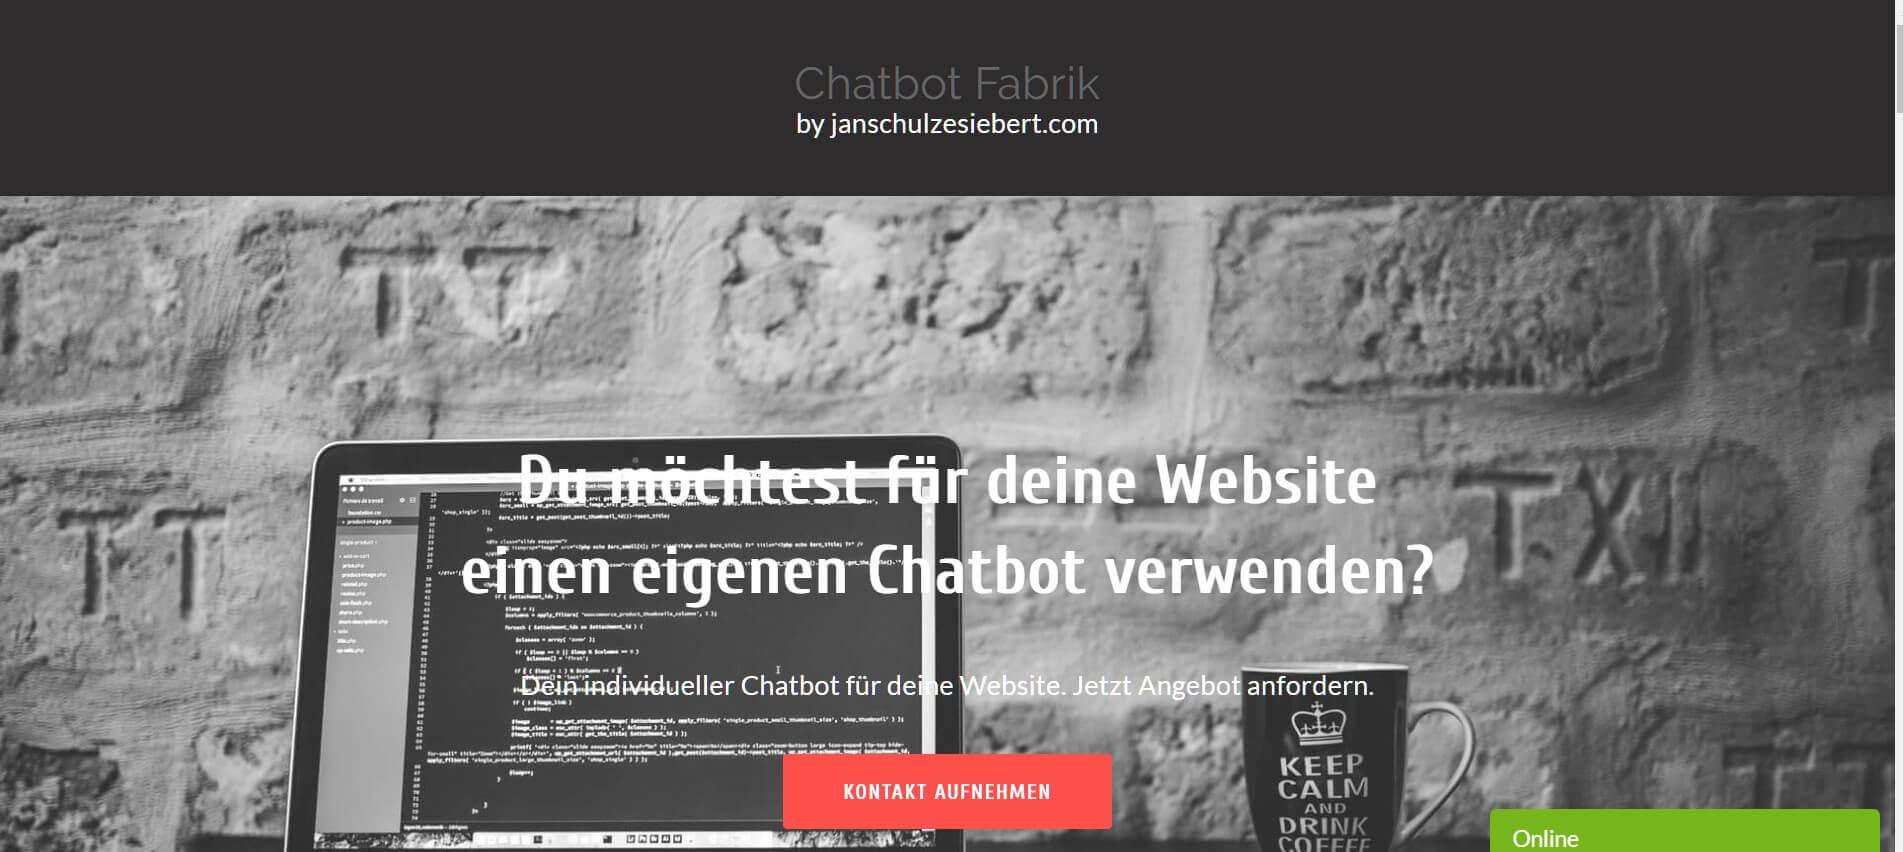 Chatbot erstellen Chatbot Fabrik